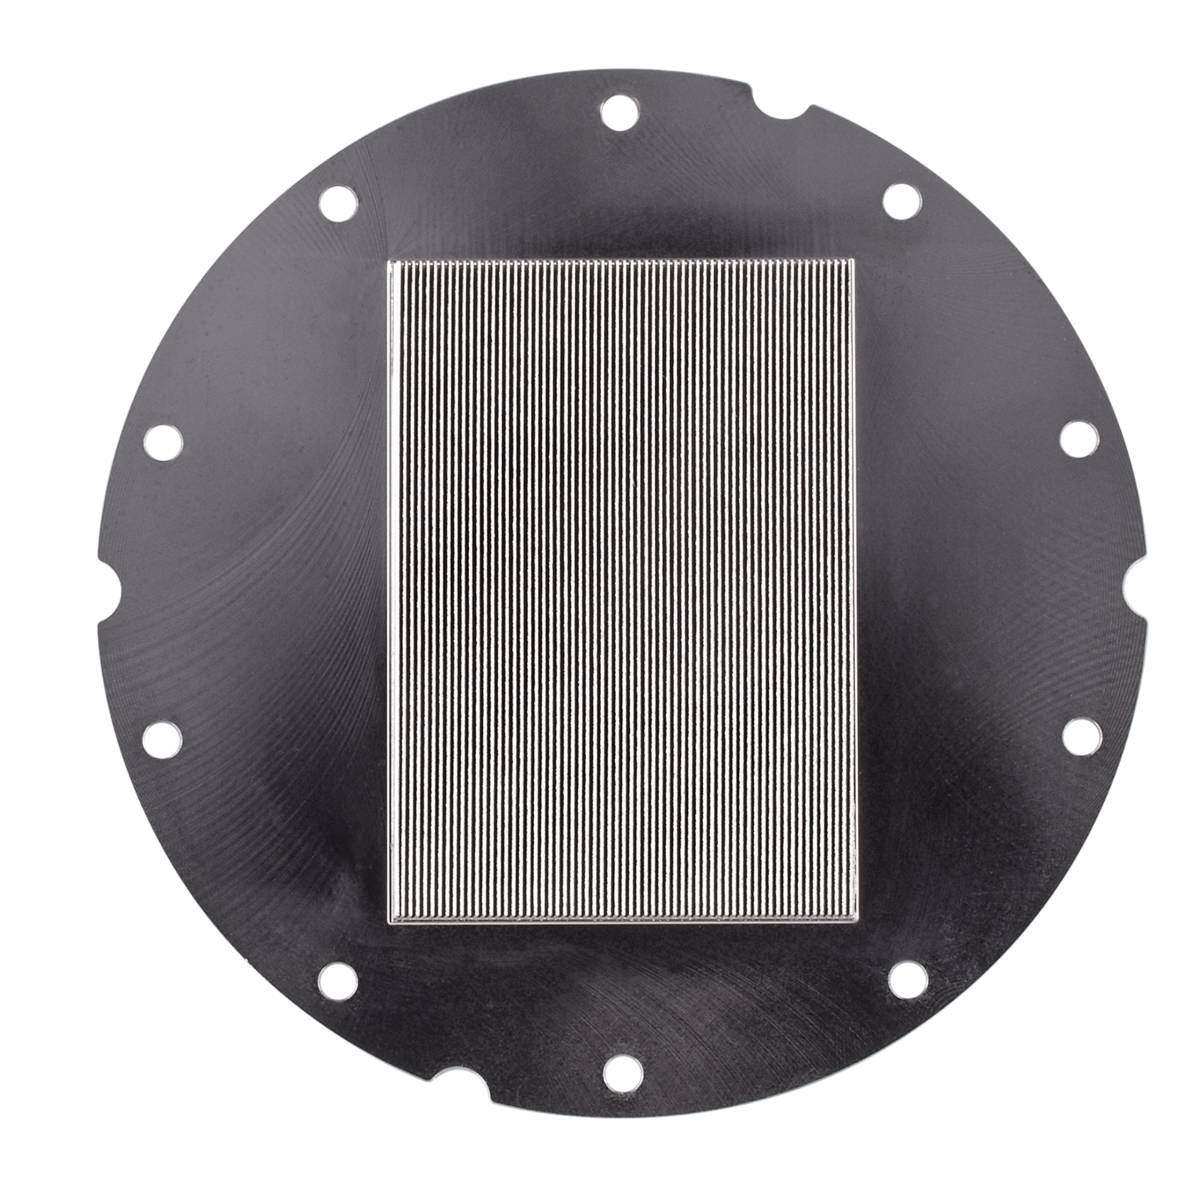 CORSAIR Hydro X Series XC7 RGB CPU Water Block (115X/AM4)